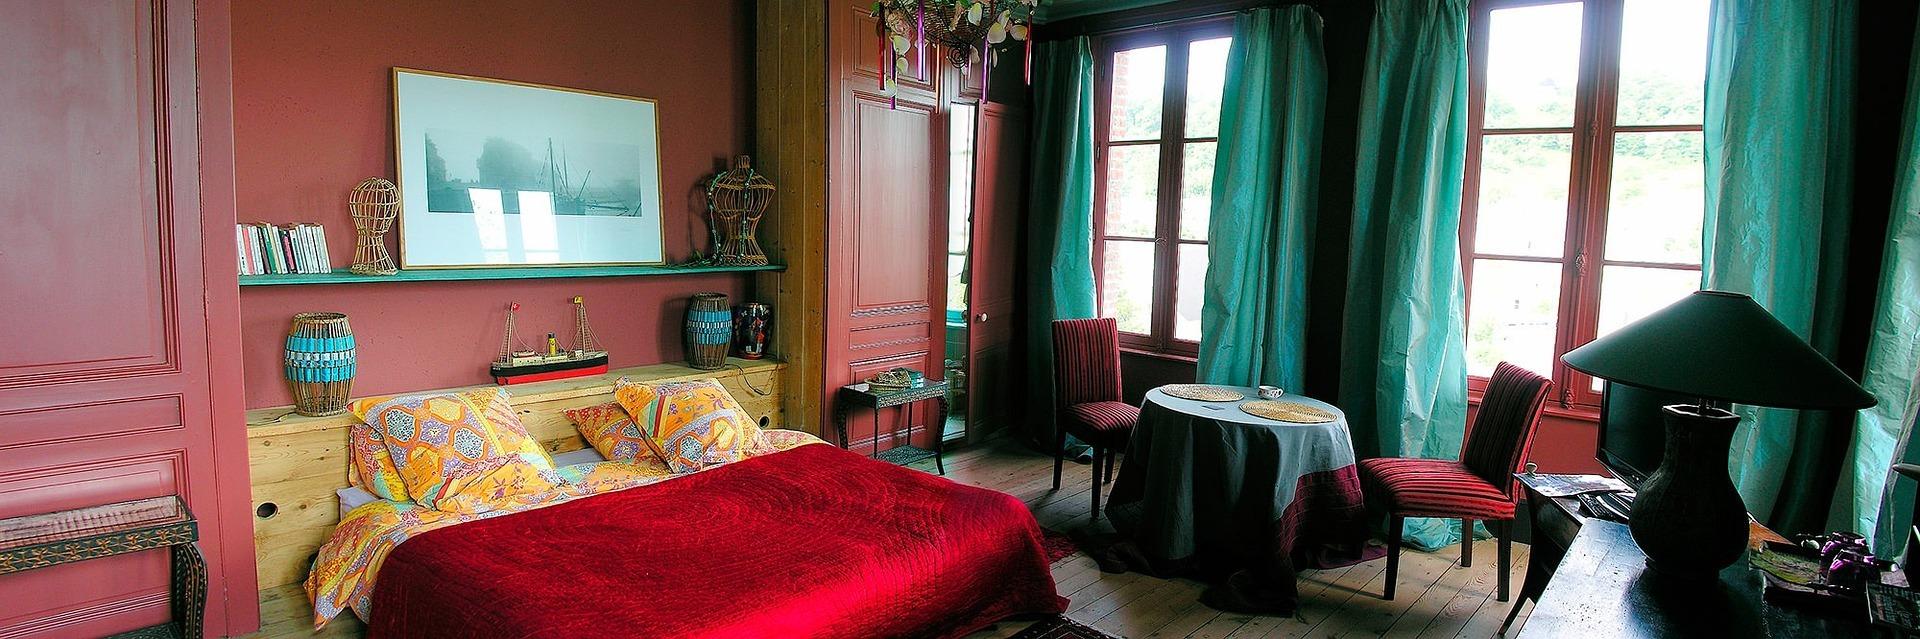 tagesdecke bett berwurf der wow effekt f rs bett. Black Bedroom Furniture Sets. Home Design Ideas